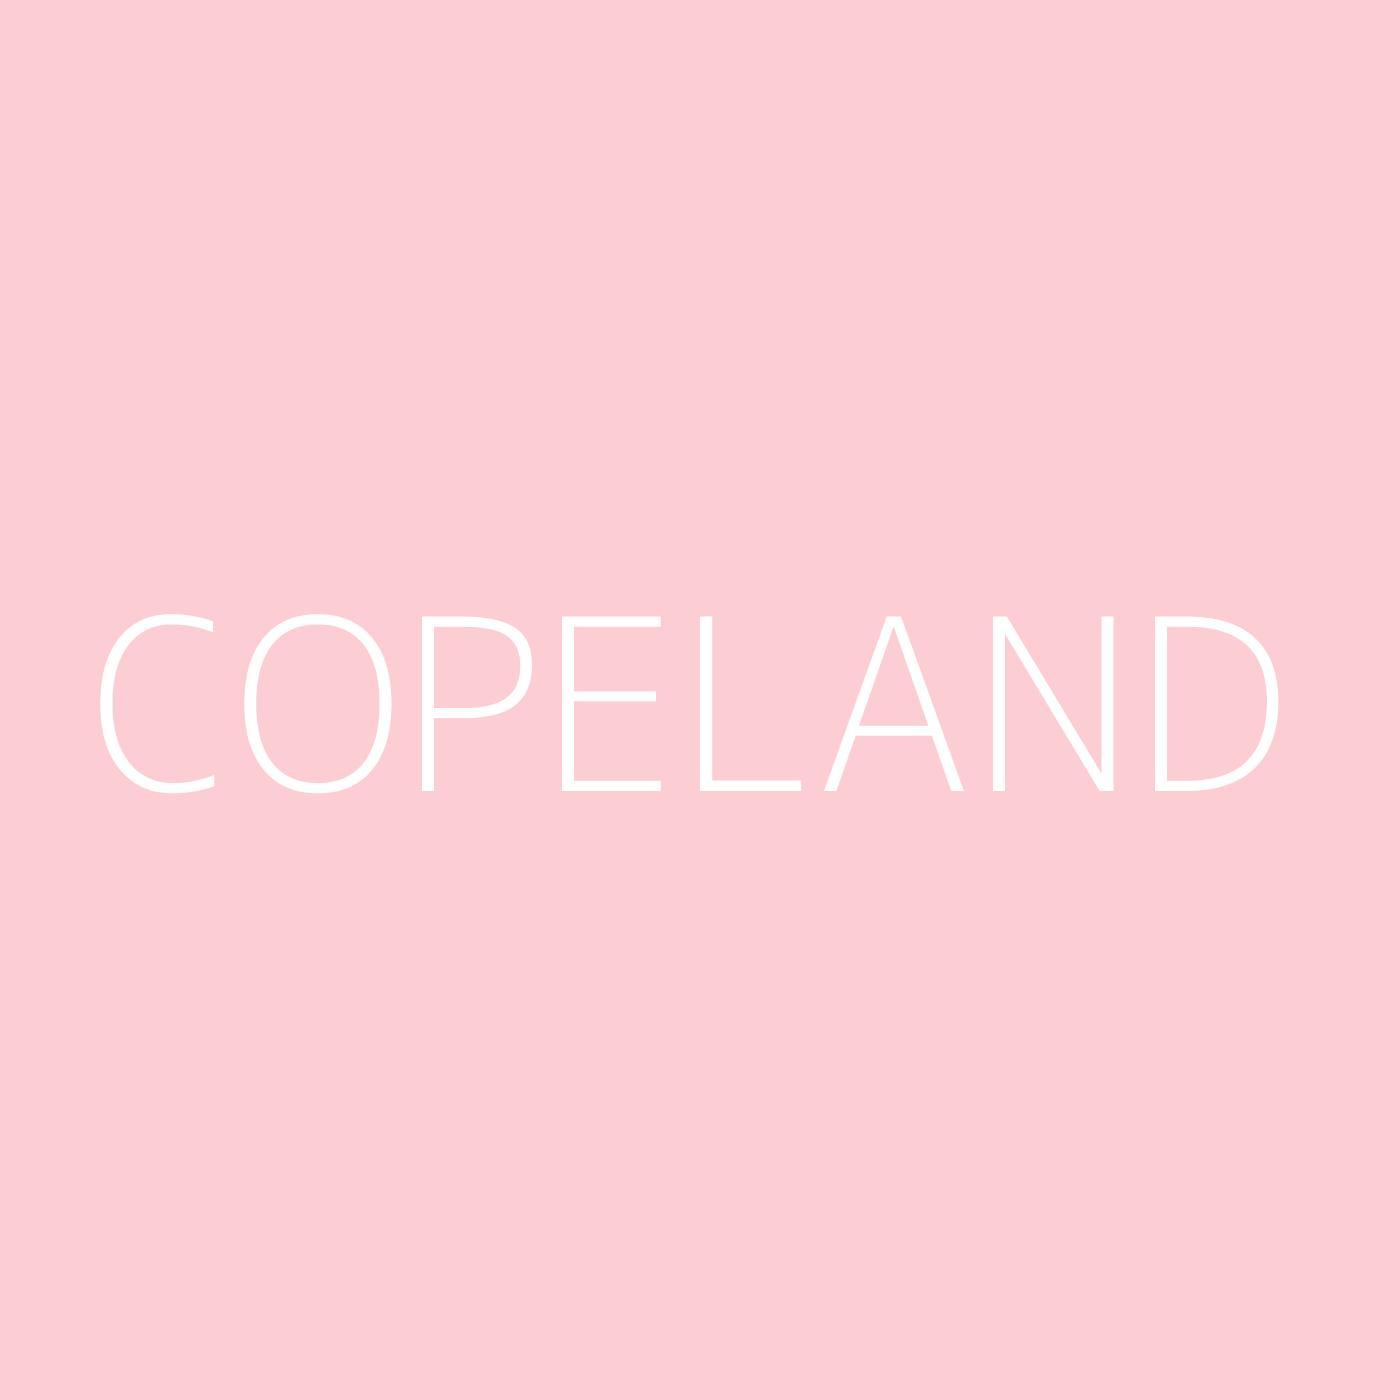 Copeland Playlist Artwork